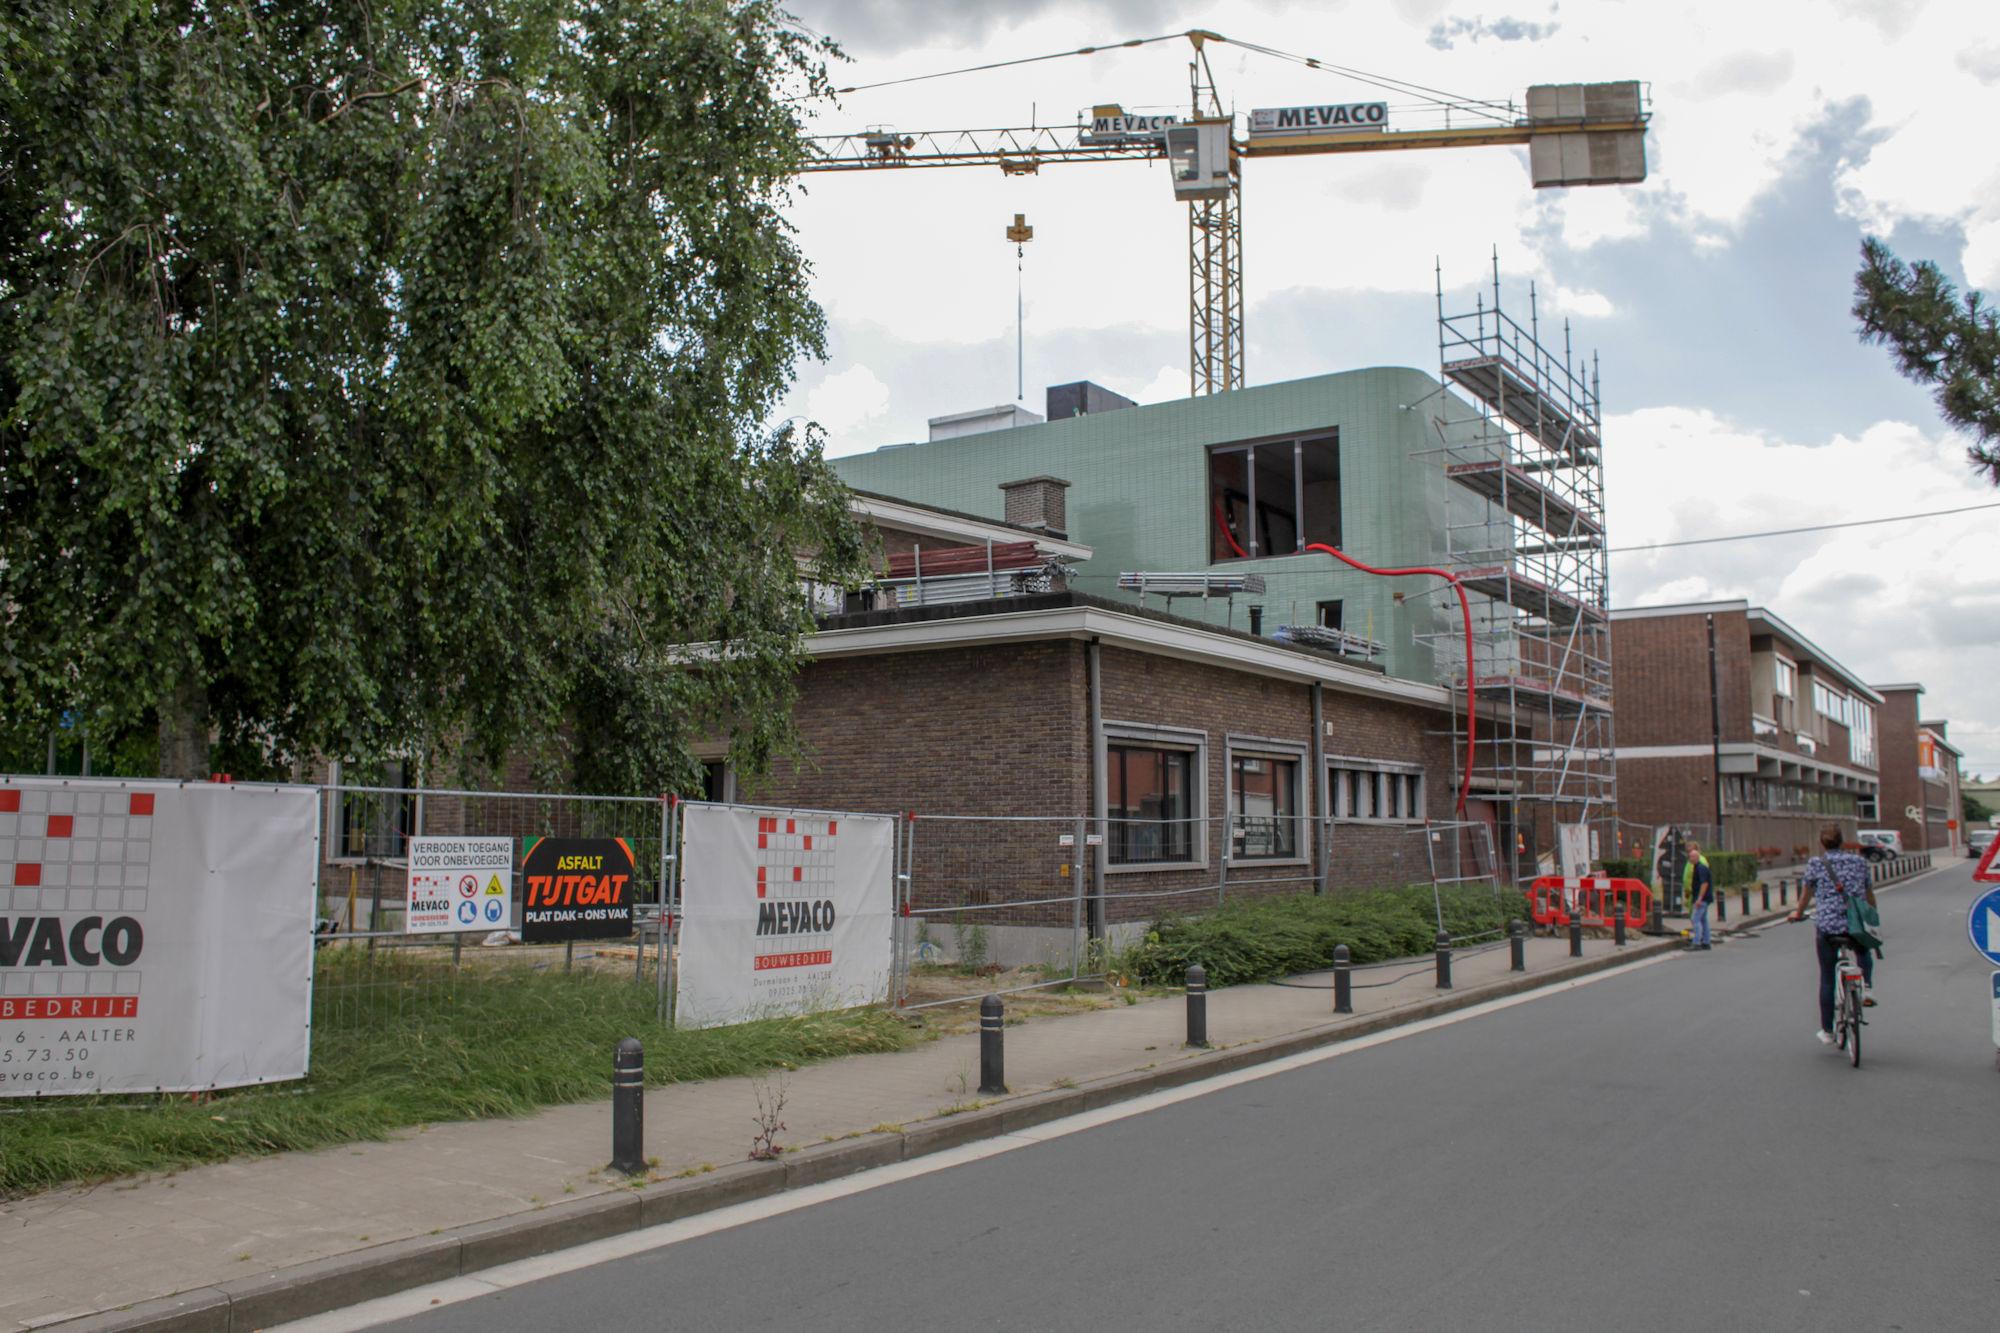 2019-07-02 Muide Meulestede prospectie Wannes_stadsvernieuwing_IMG_0326-3.jpg